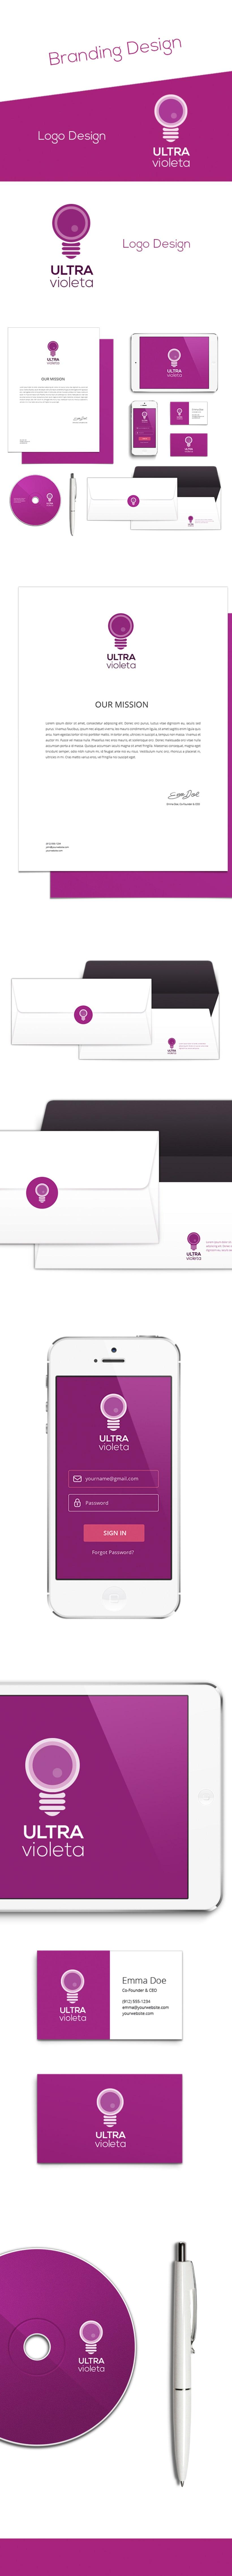 Publicity company´s branding design -1